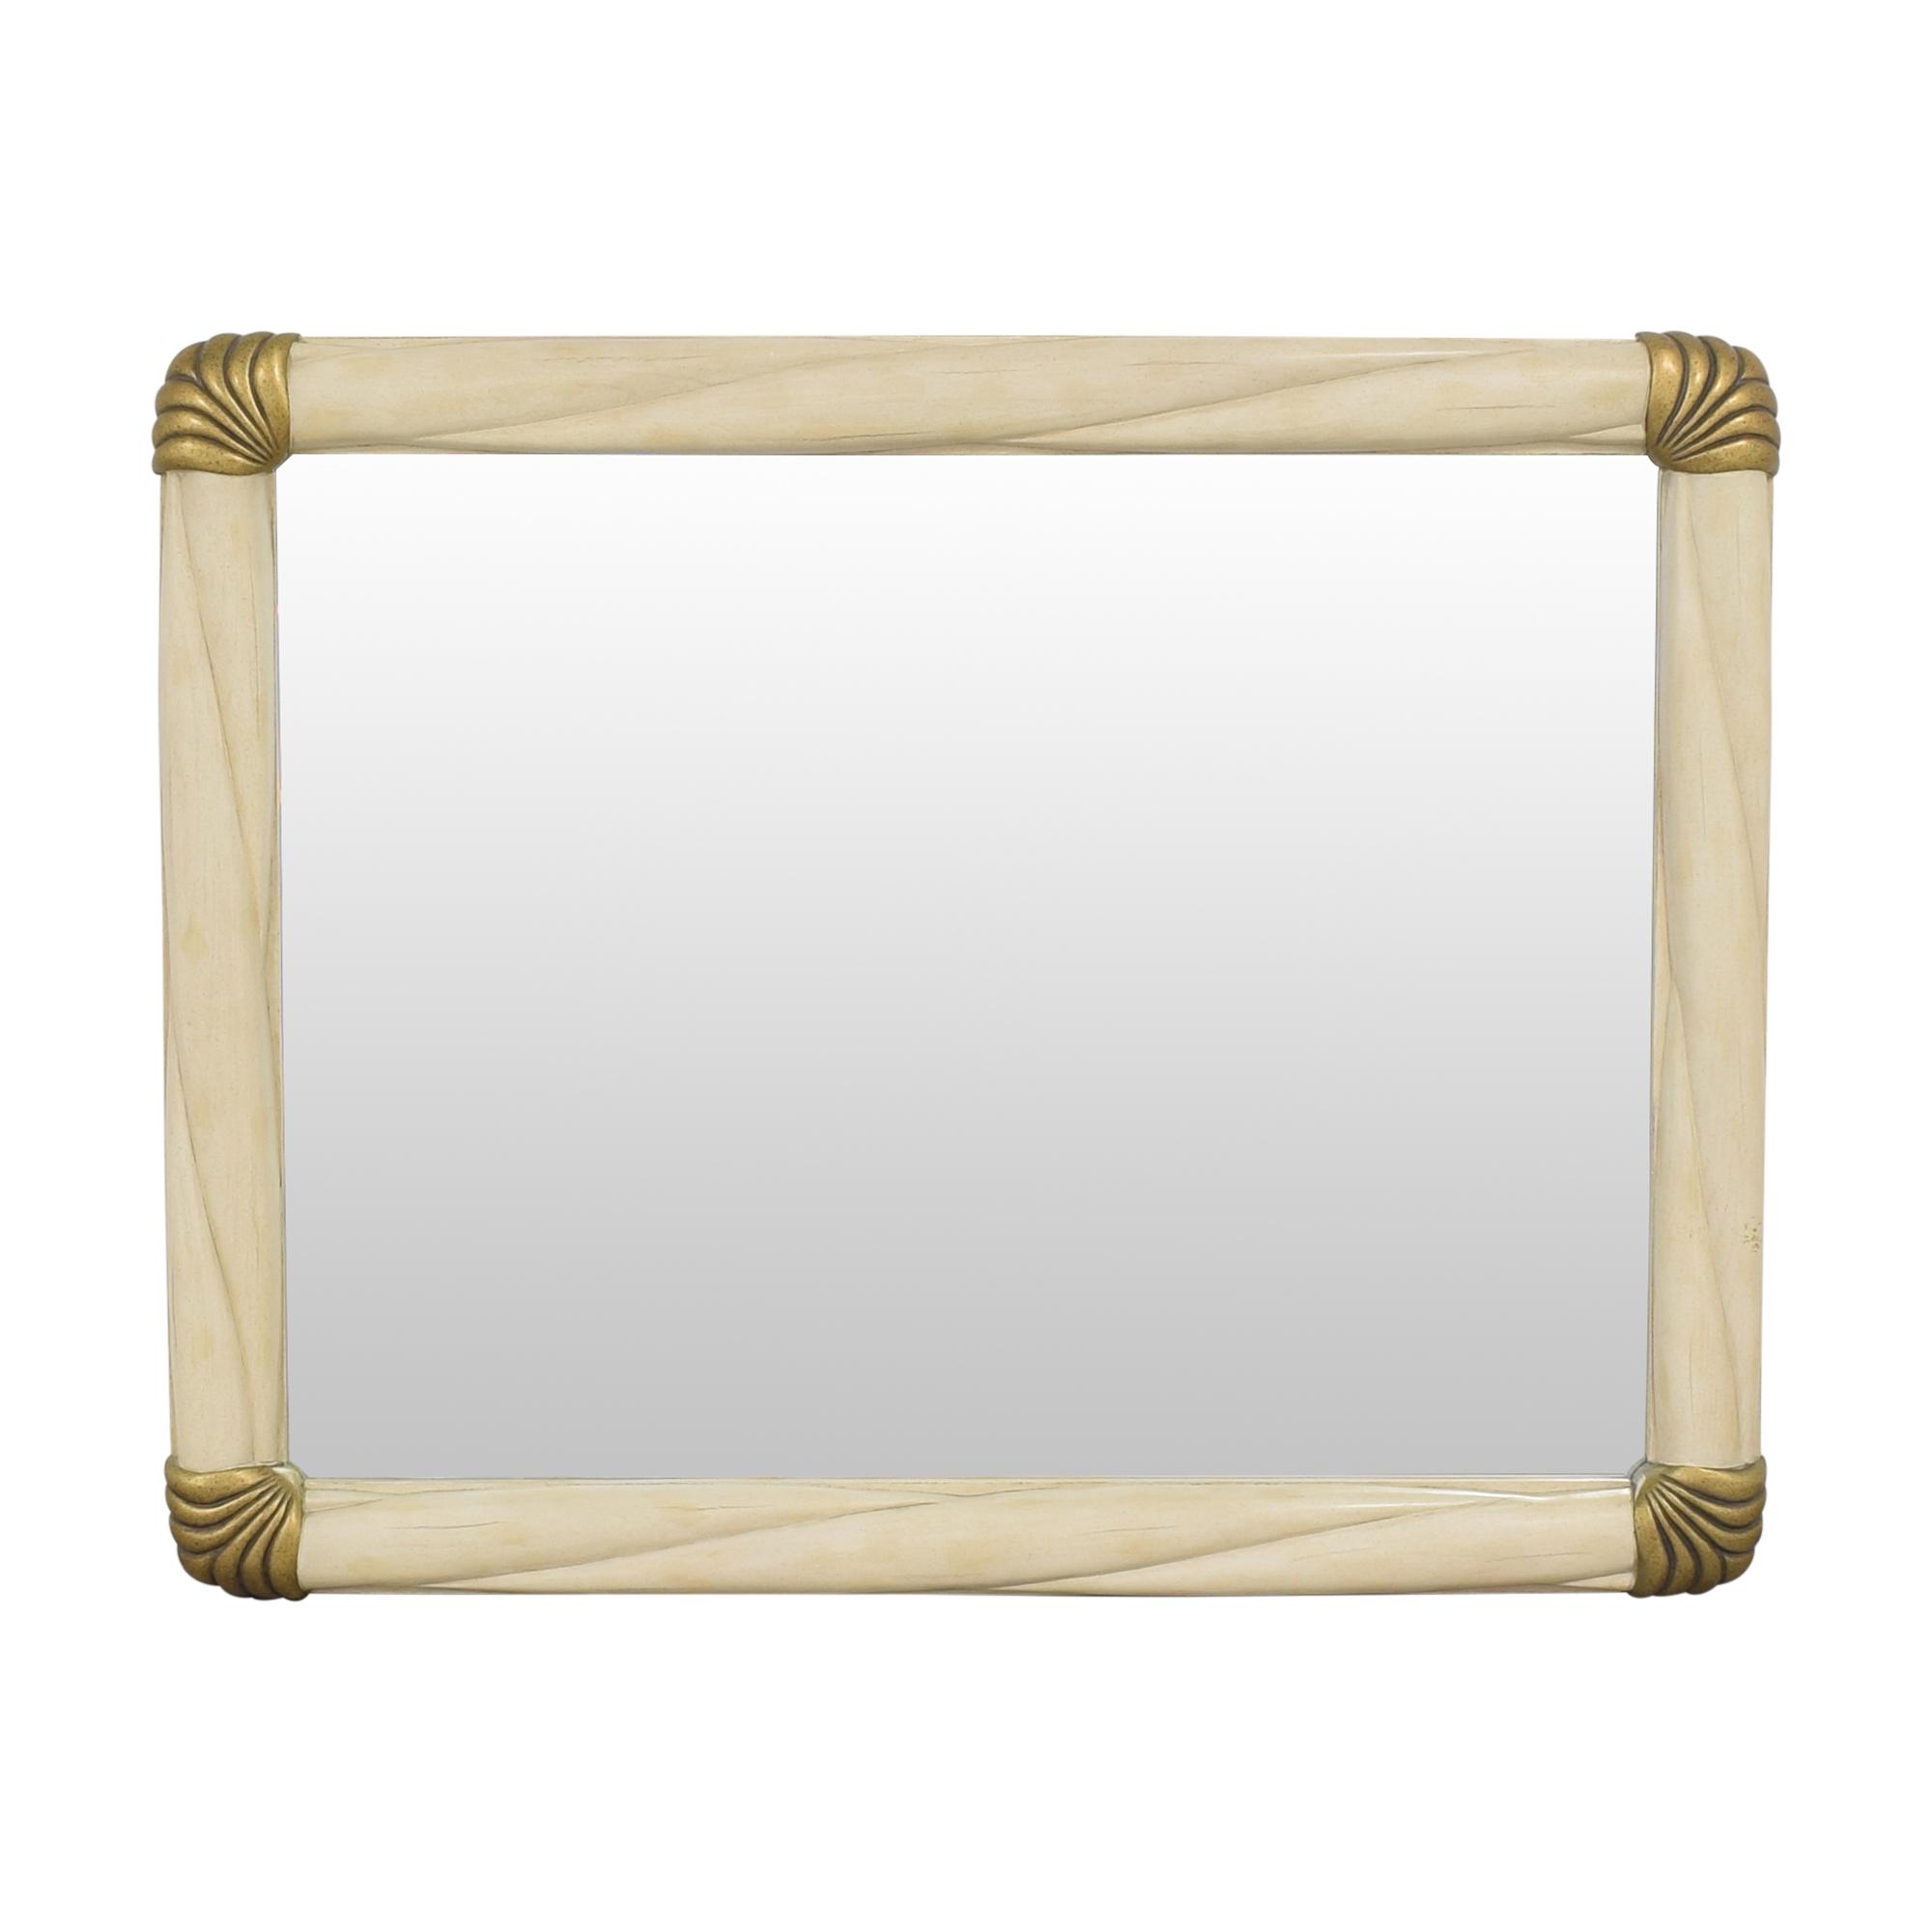 Bernhardt Bernhardt Framed Wall Mirror cream & gold